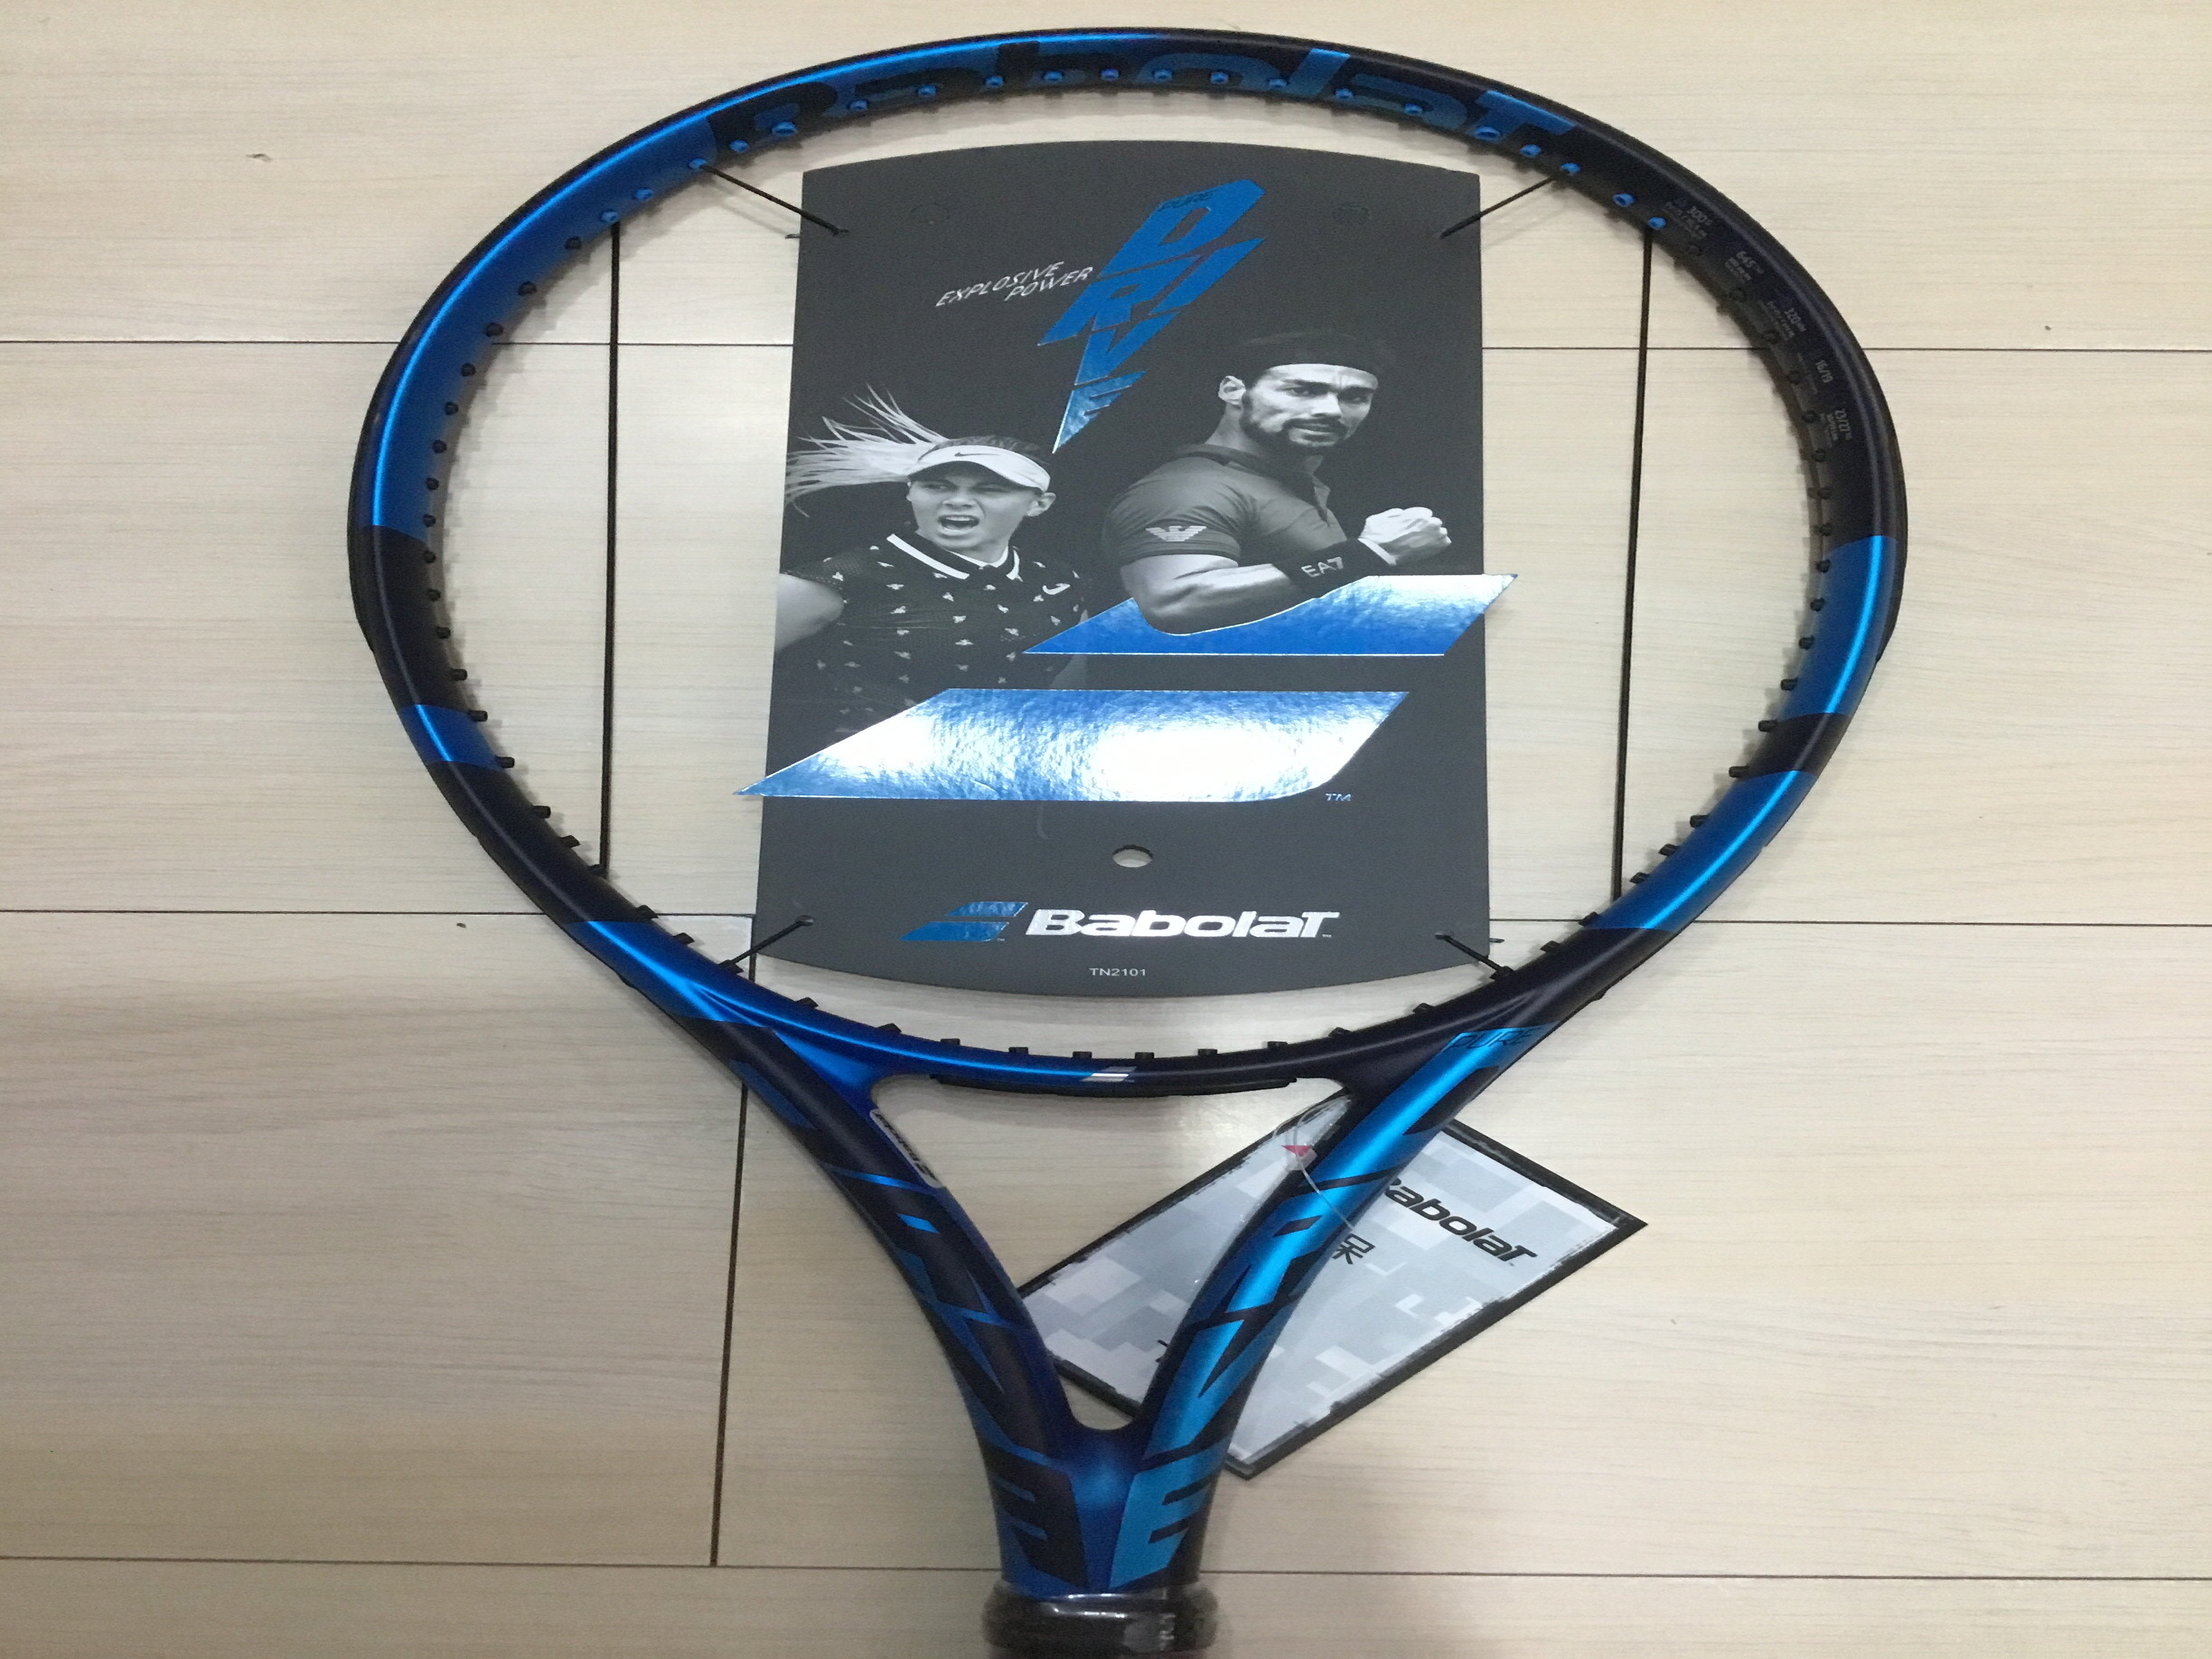 2020 Babolat Pure Drive 專業網球拍